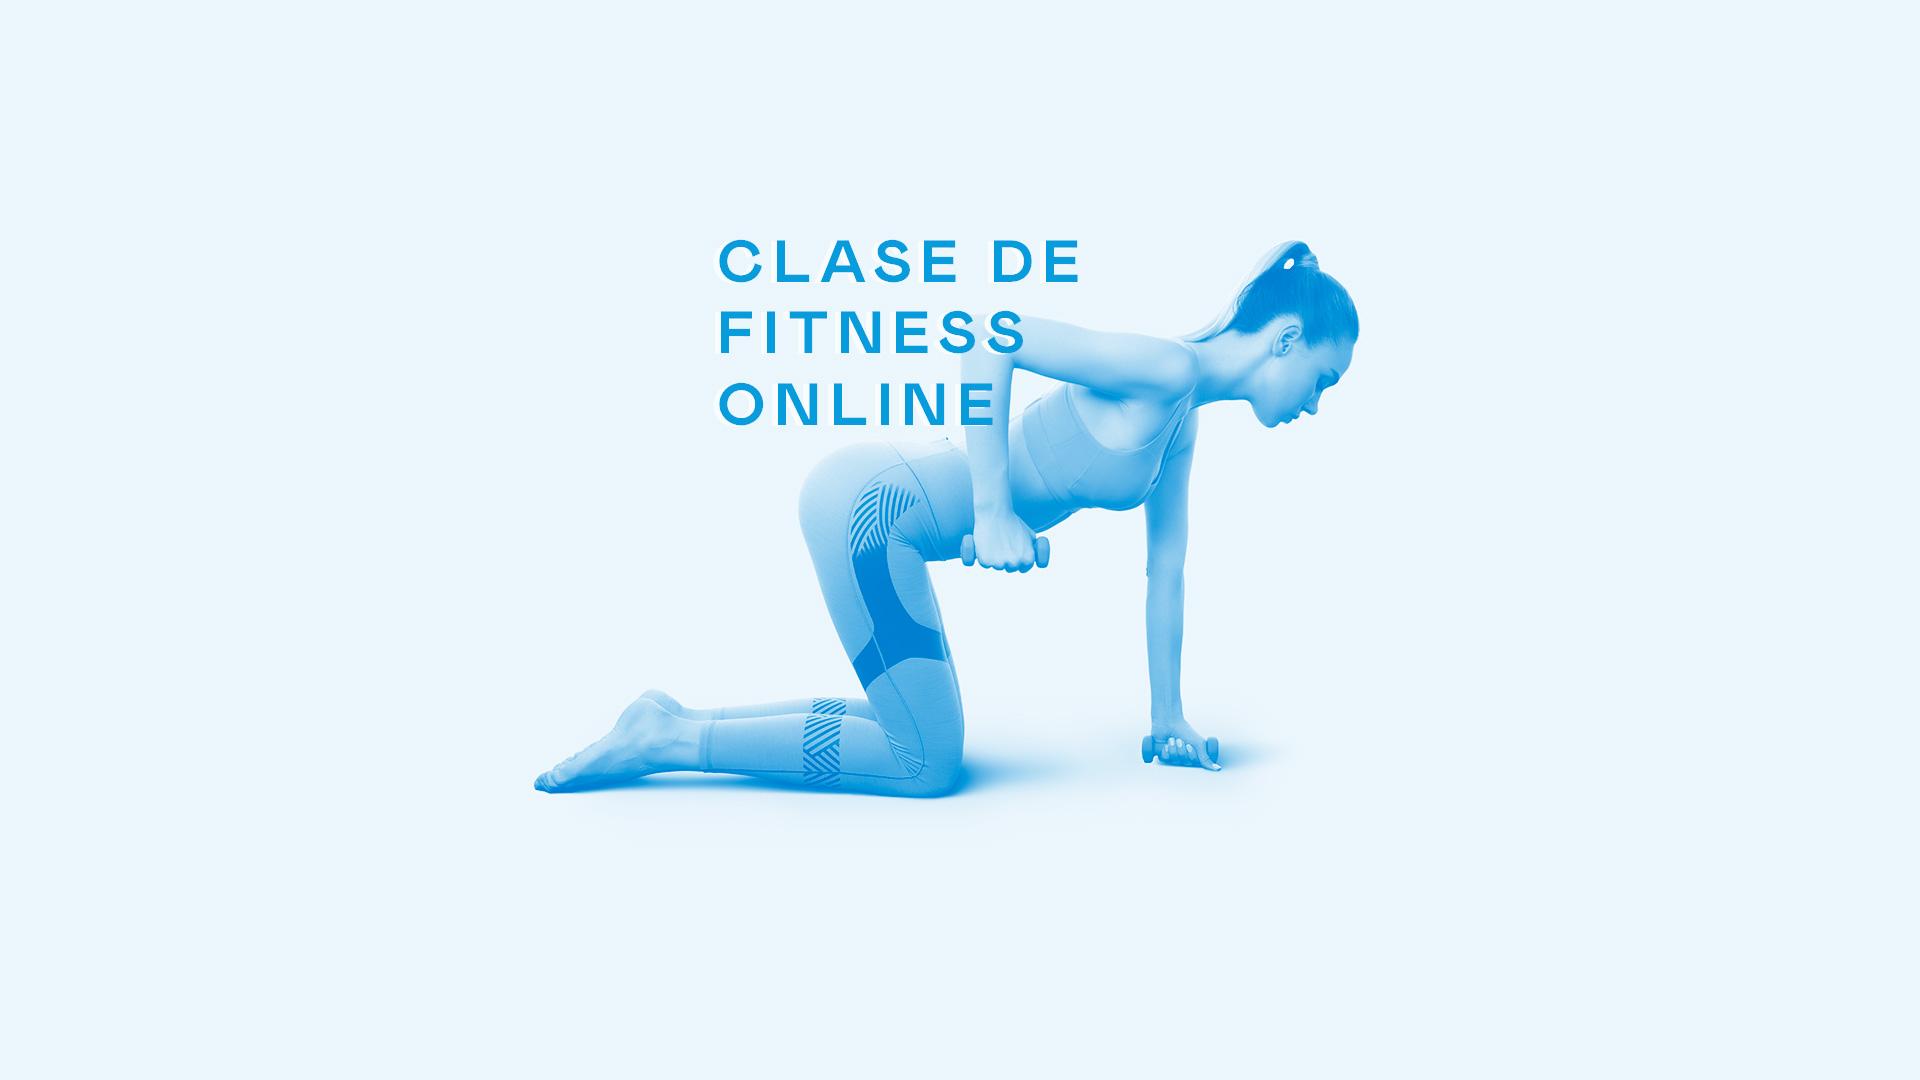 10 clase de fitness la care poți participa online